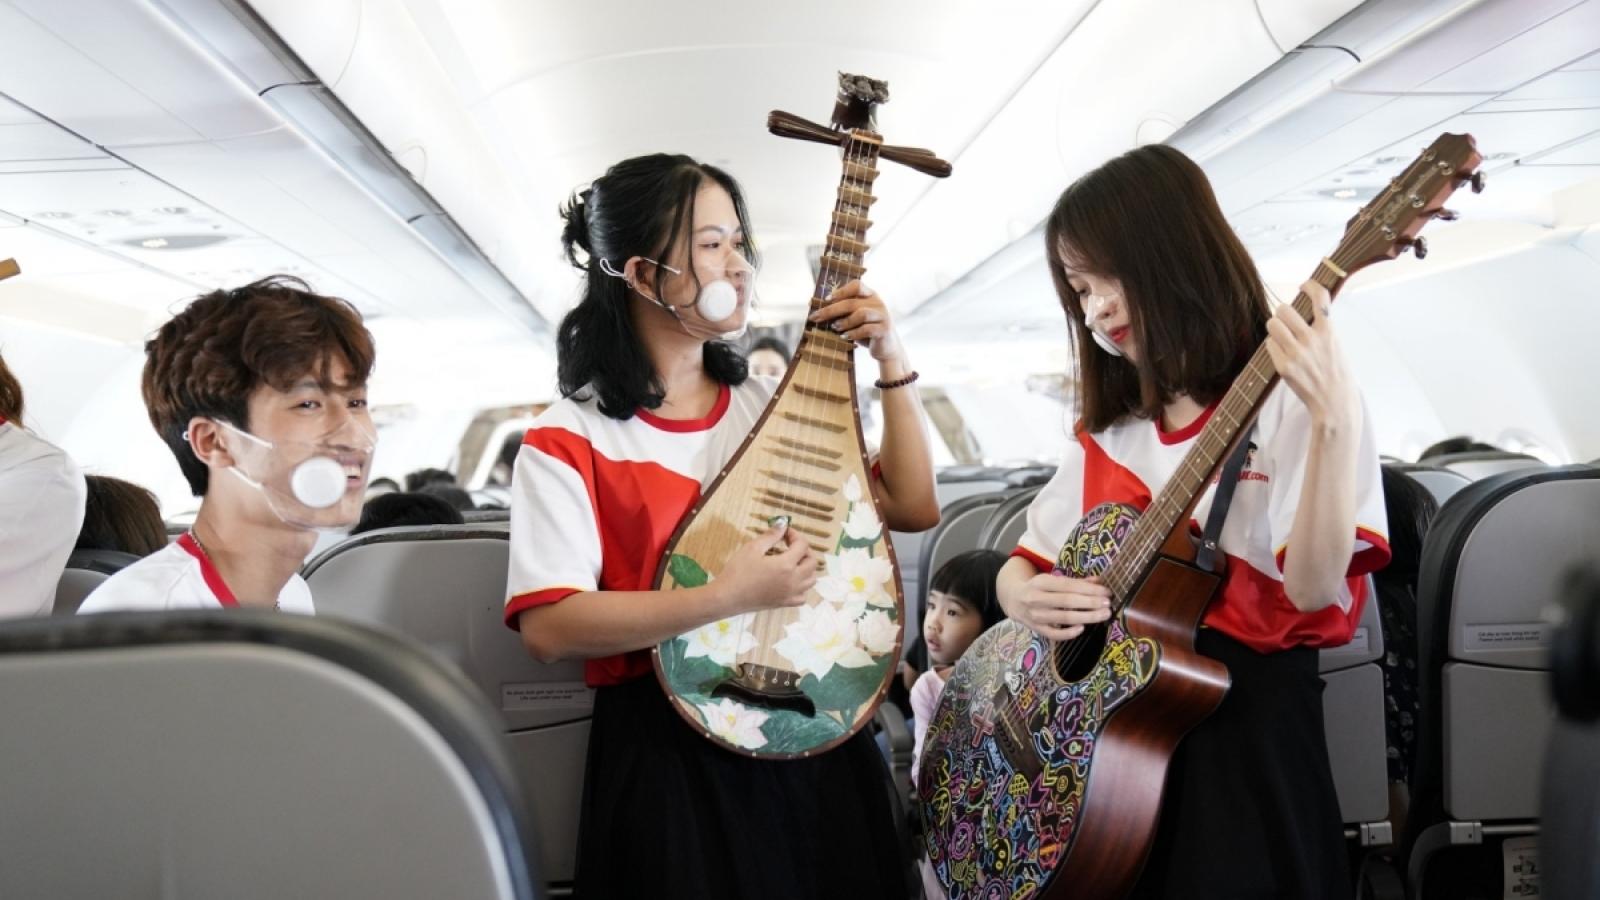 VietJet Air entertain passengers on board with live art performances